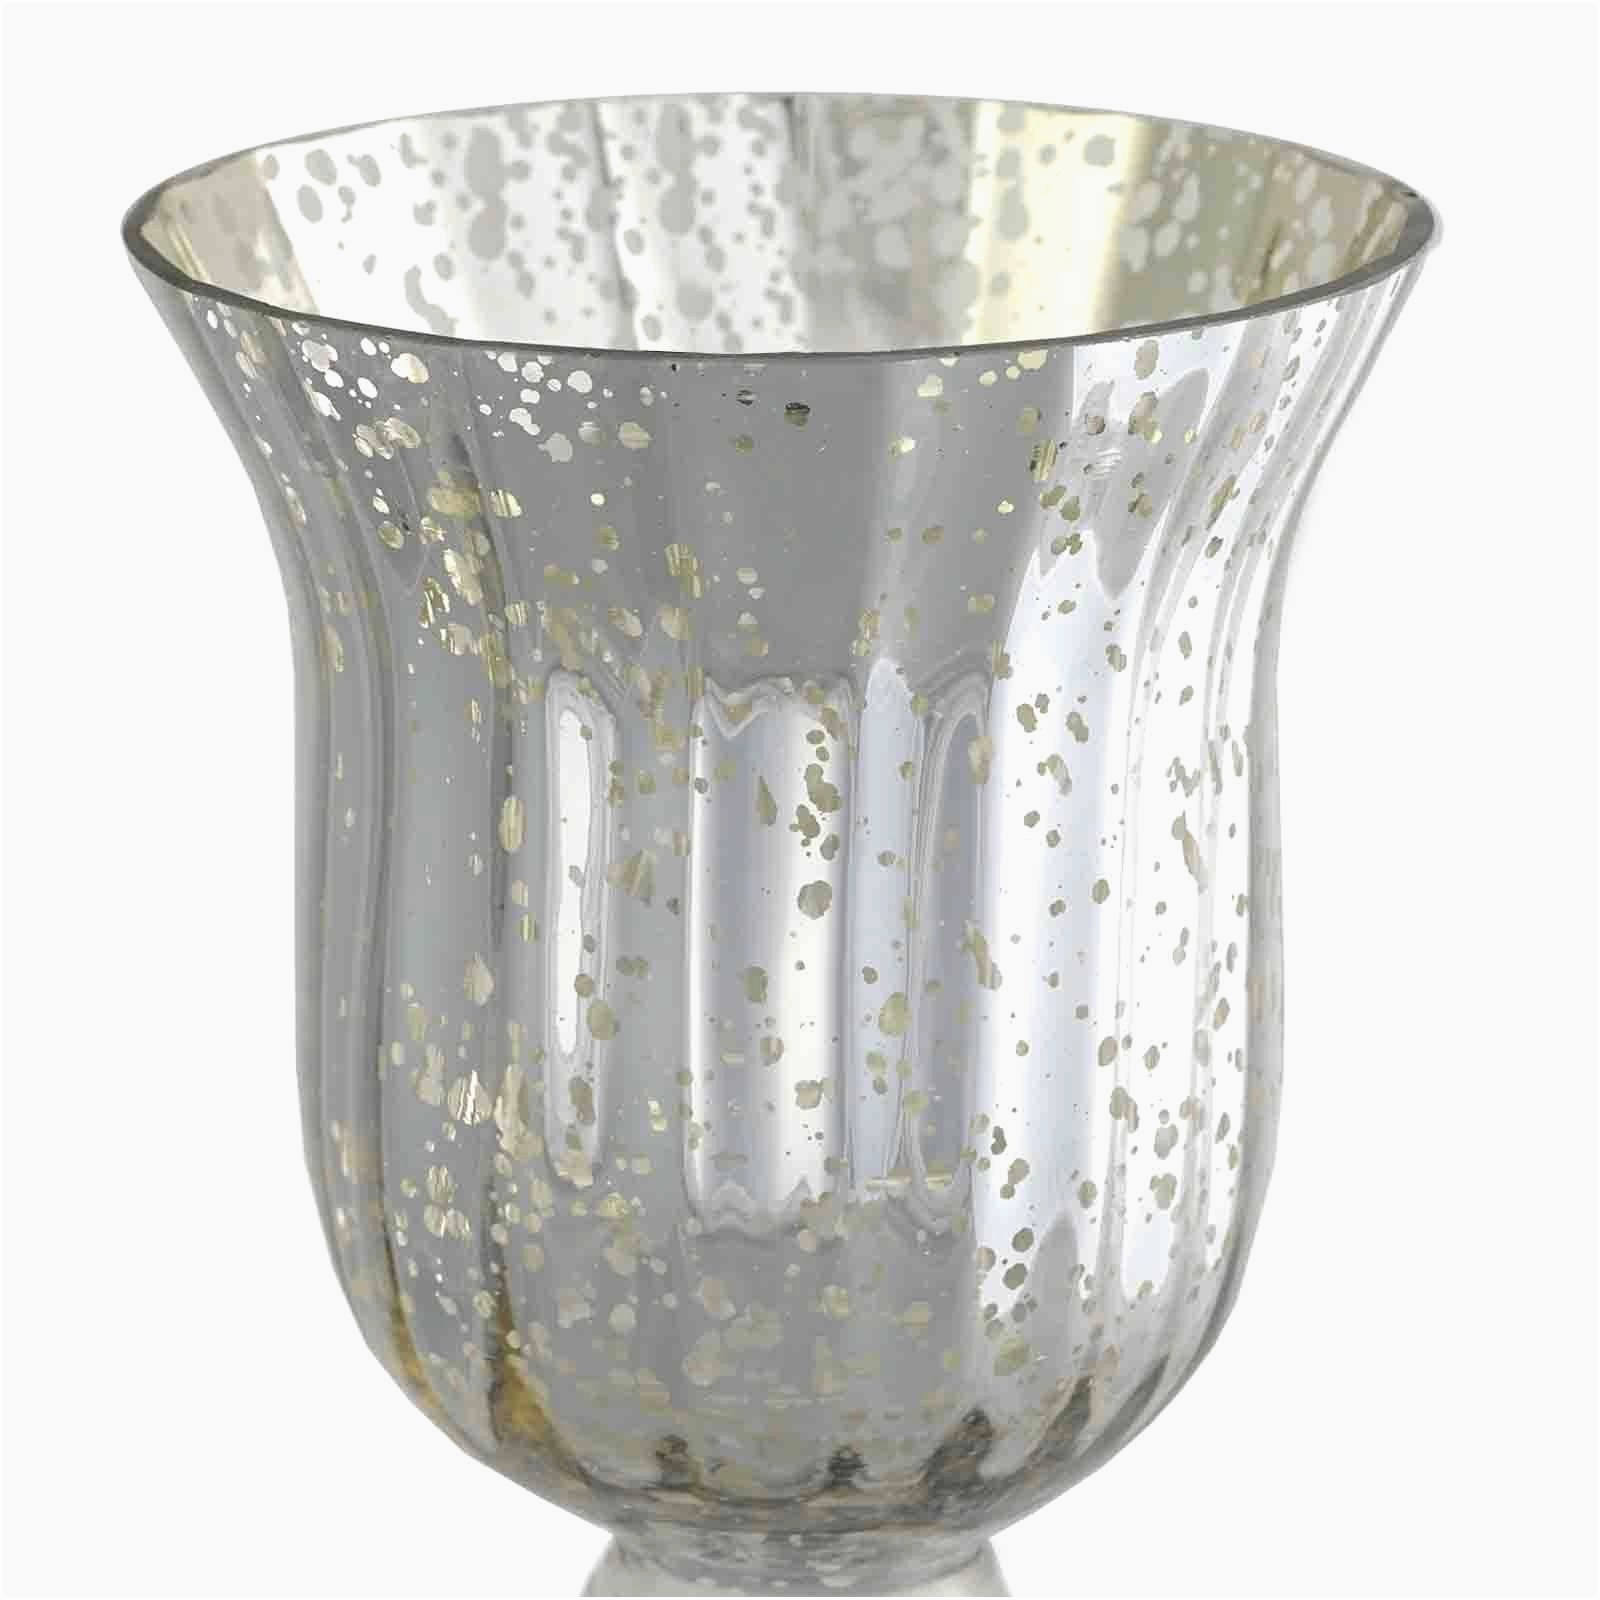 9 cylinder vase wholesale of wedding invitation email wedding dress gallery regarding bulk wedding favors splendid pe s5h vases candle vase i 0d bulk in uk ideas